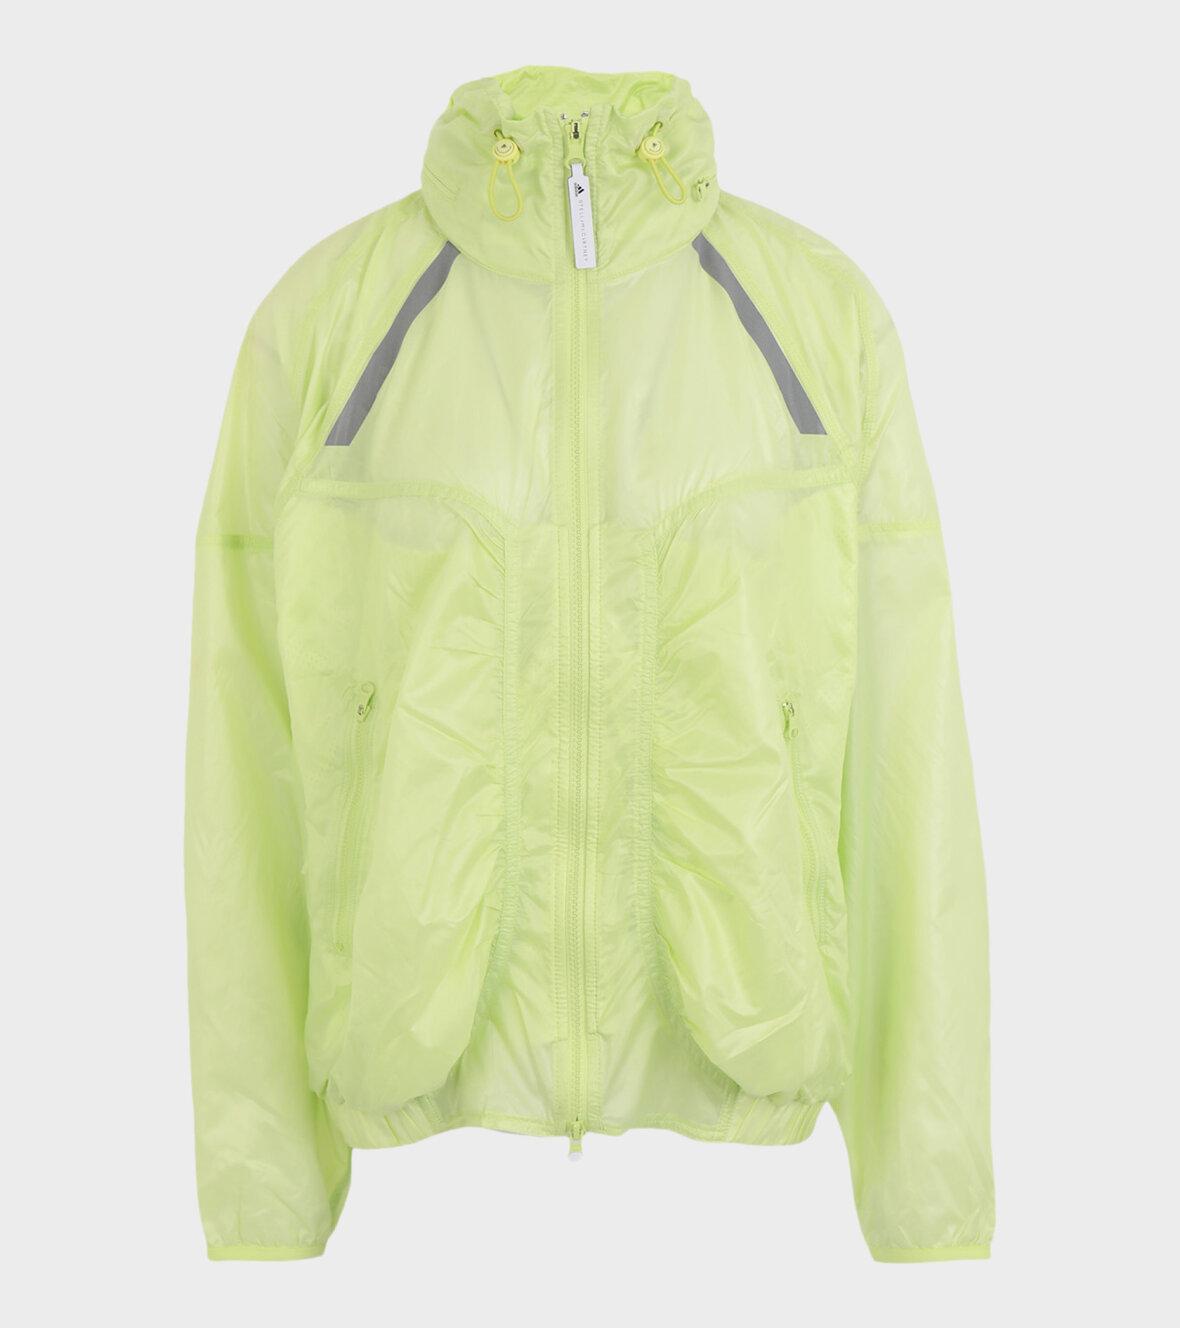 Adidas By Stella McCartney Light Jacket Neon Green dr. Adams